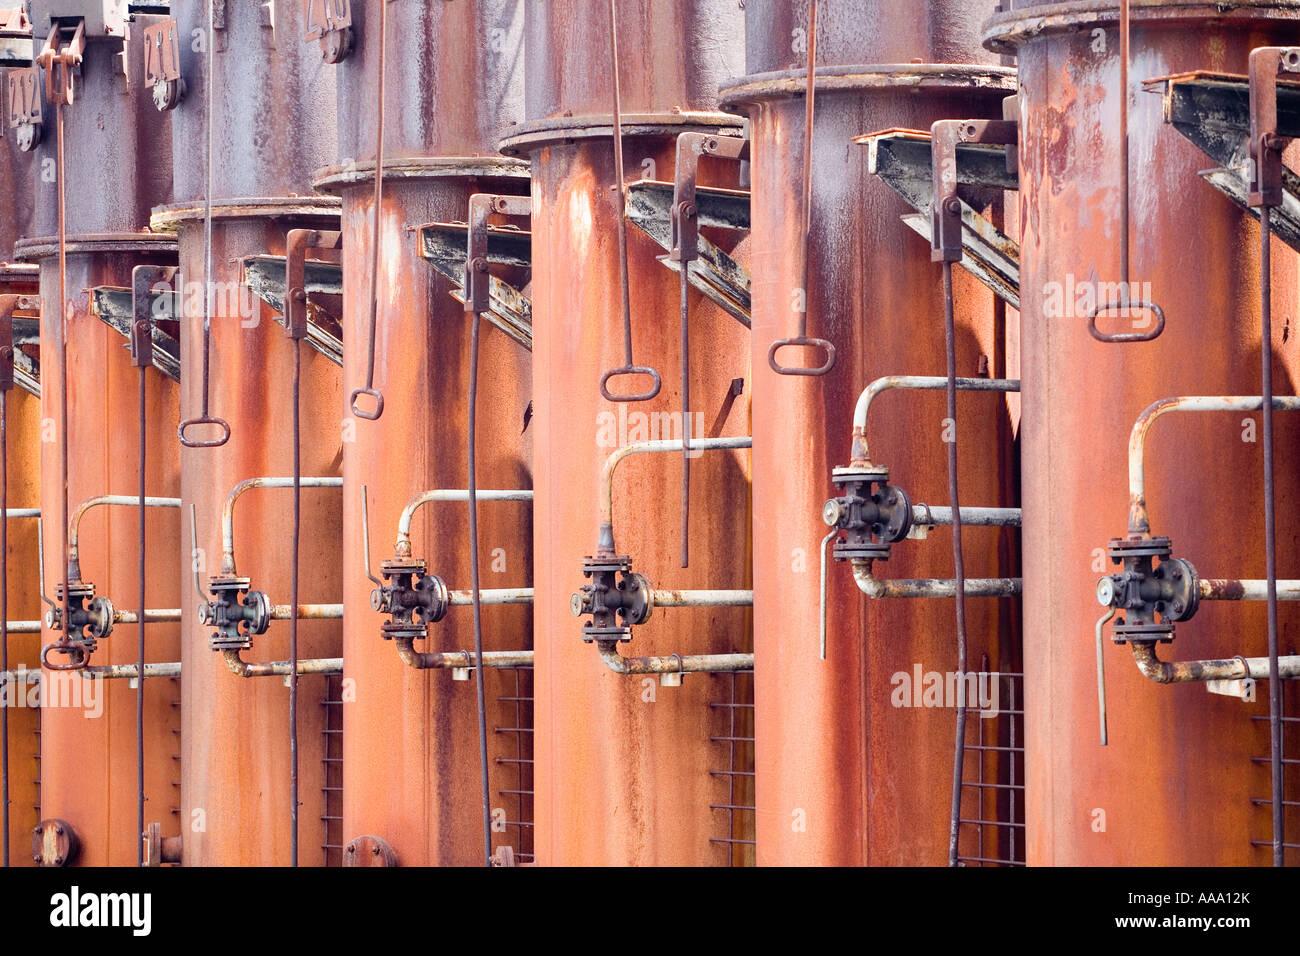 Kokerei Zollverein Essen chimneys of coking plant - Stock Image